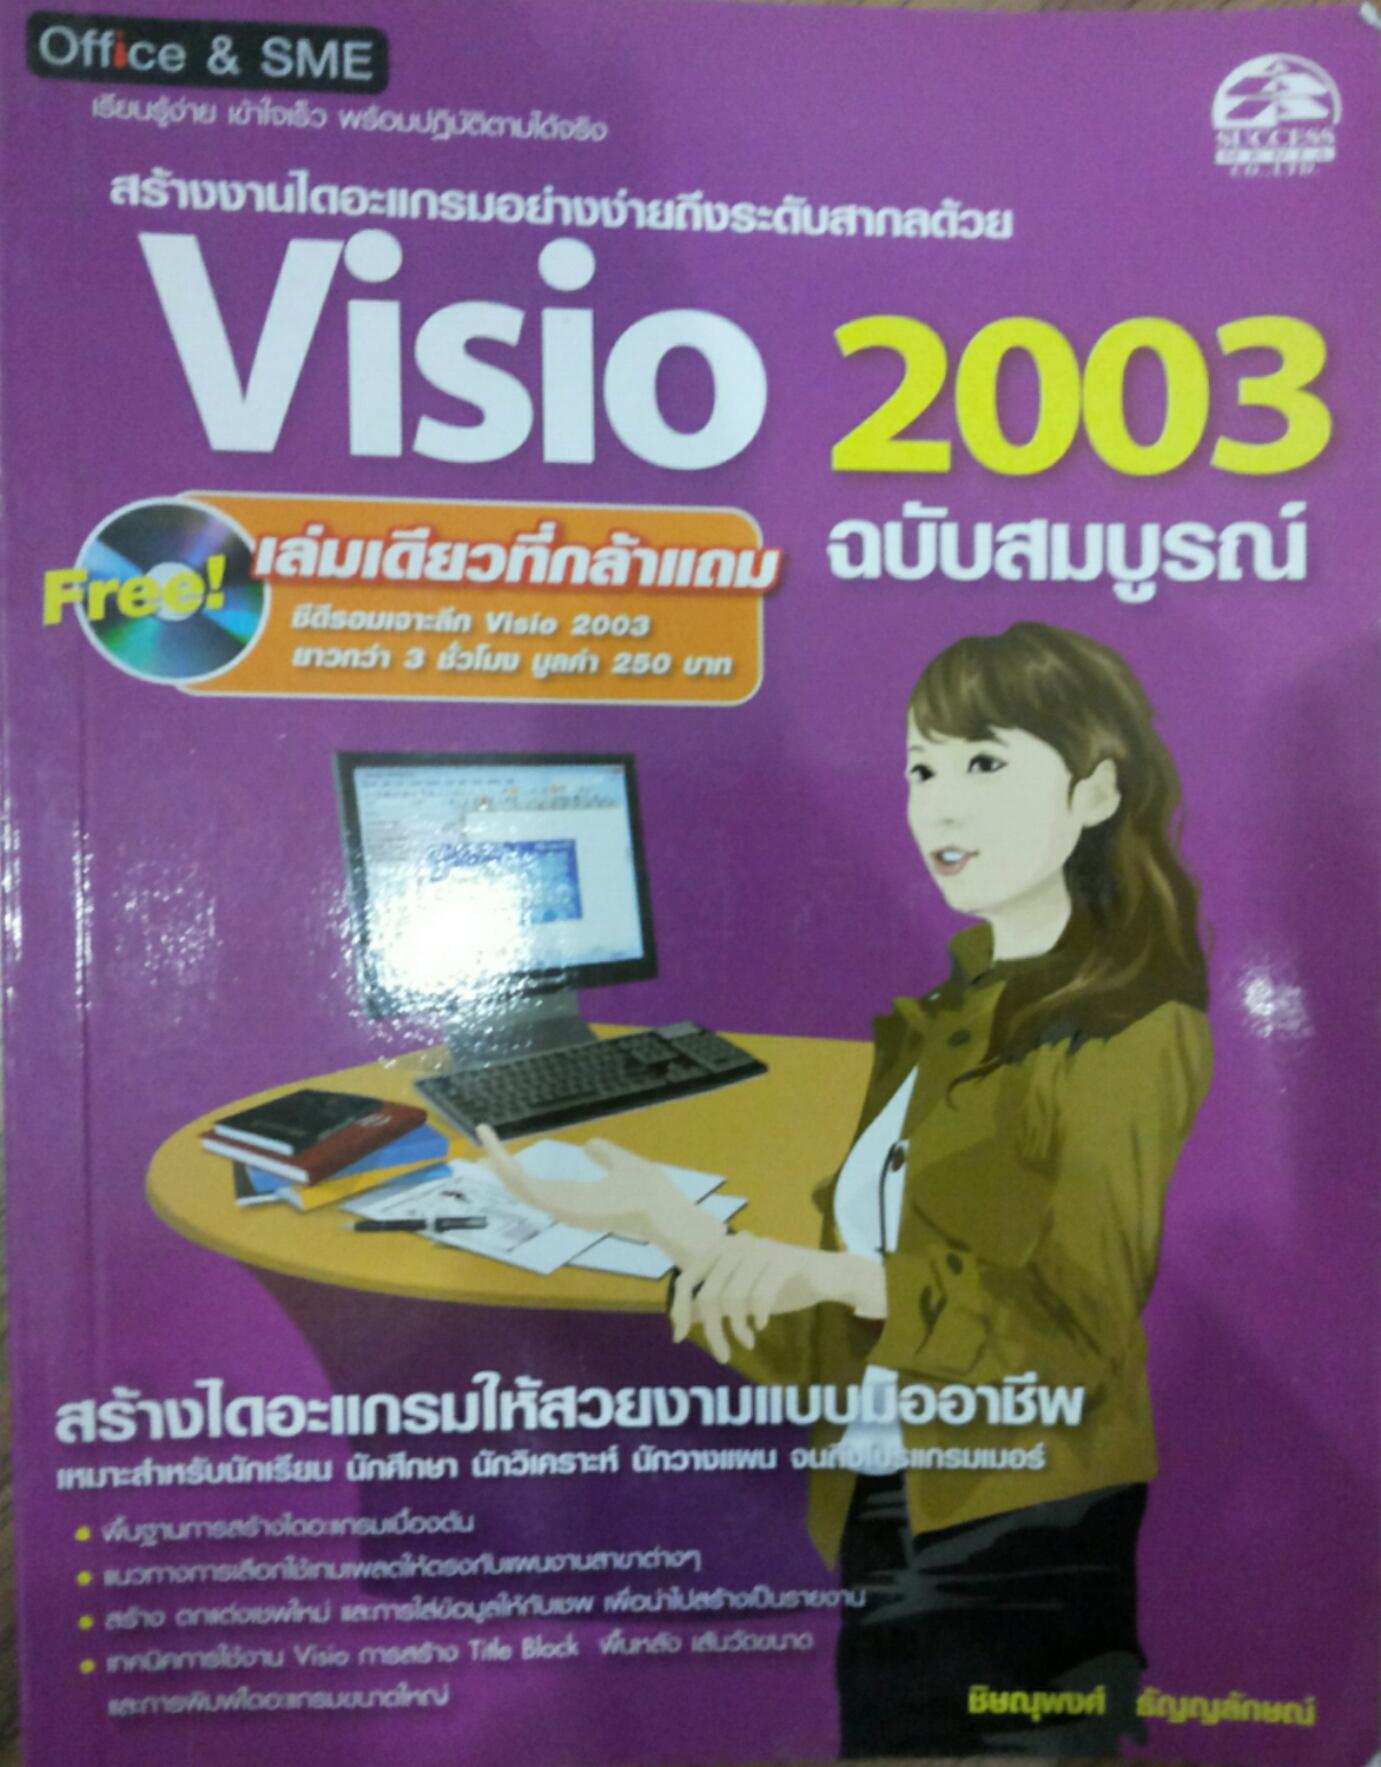 Visio 2003 ฉบับสมบูรณ์